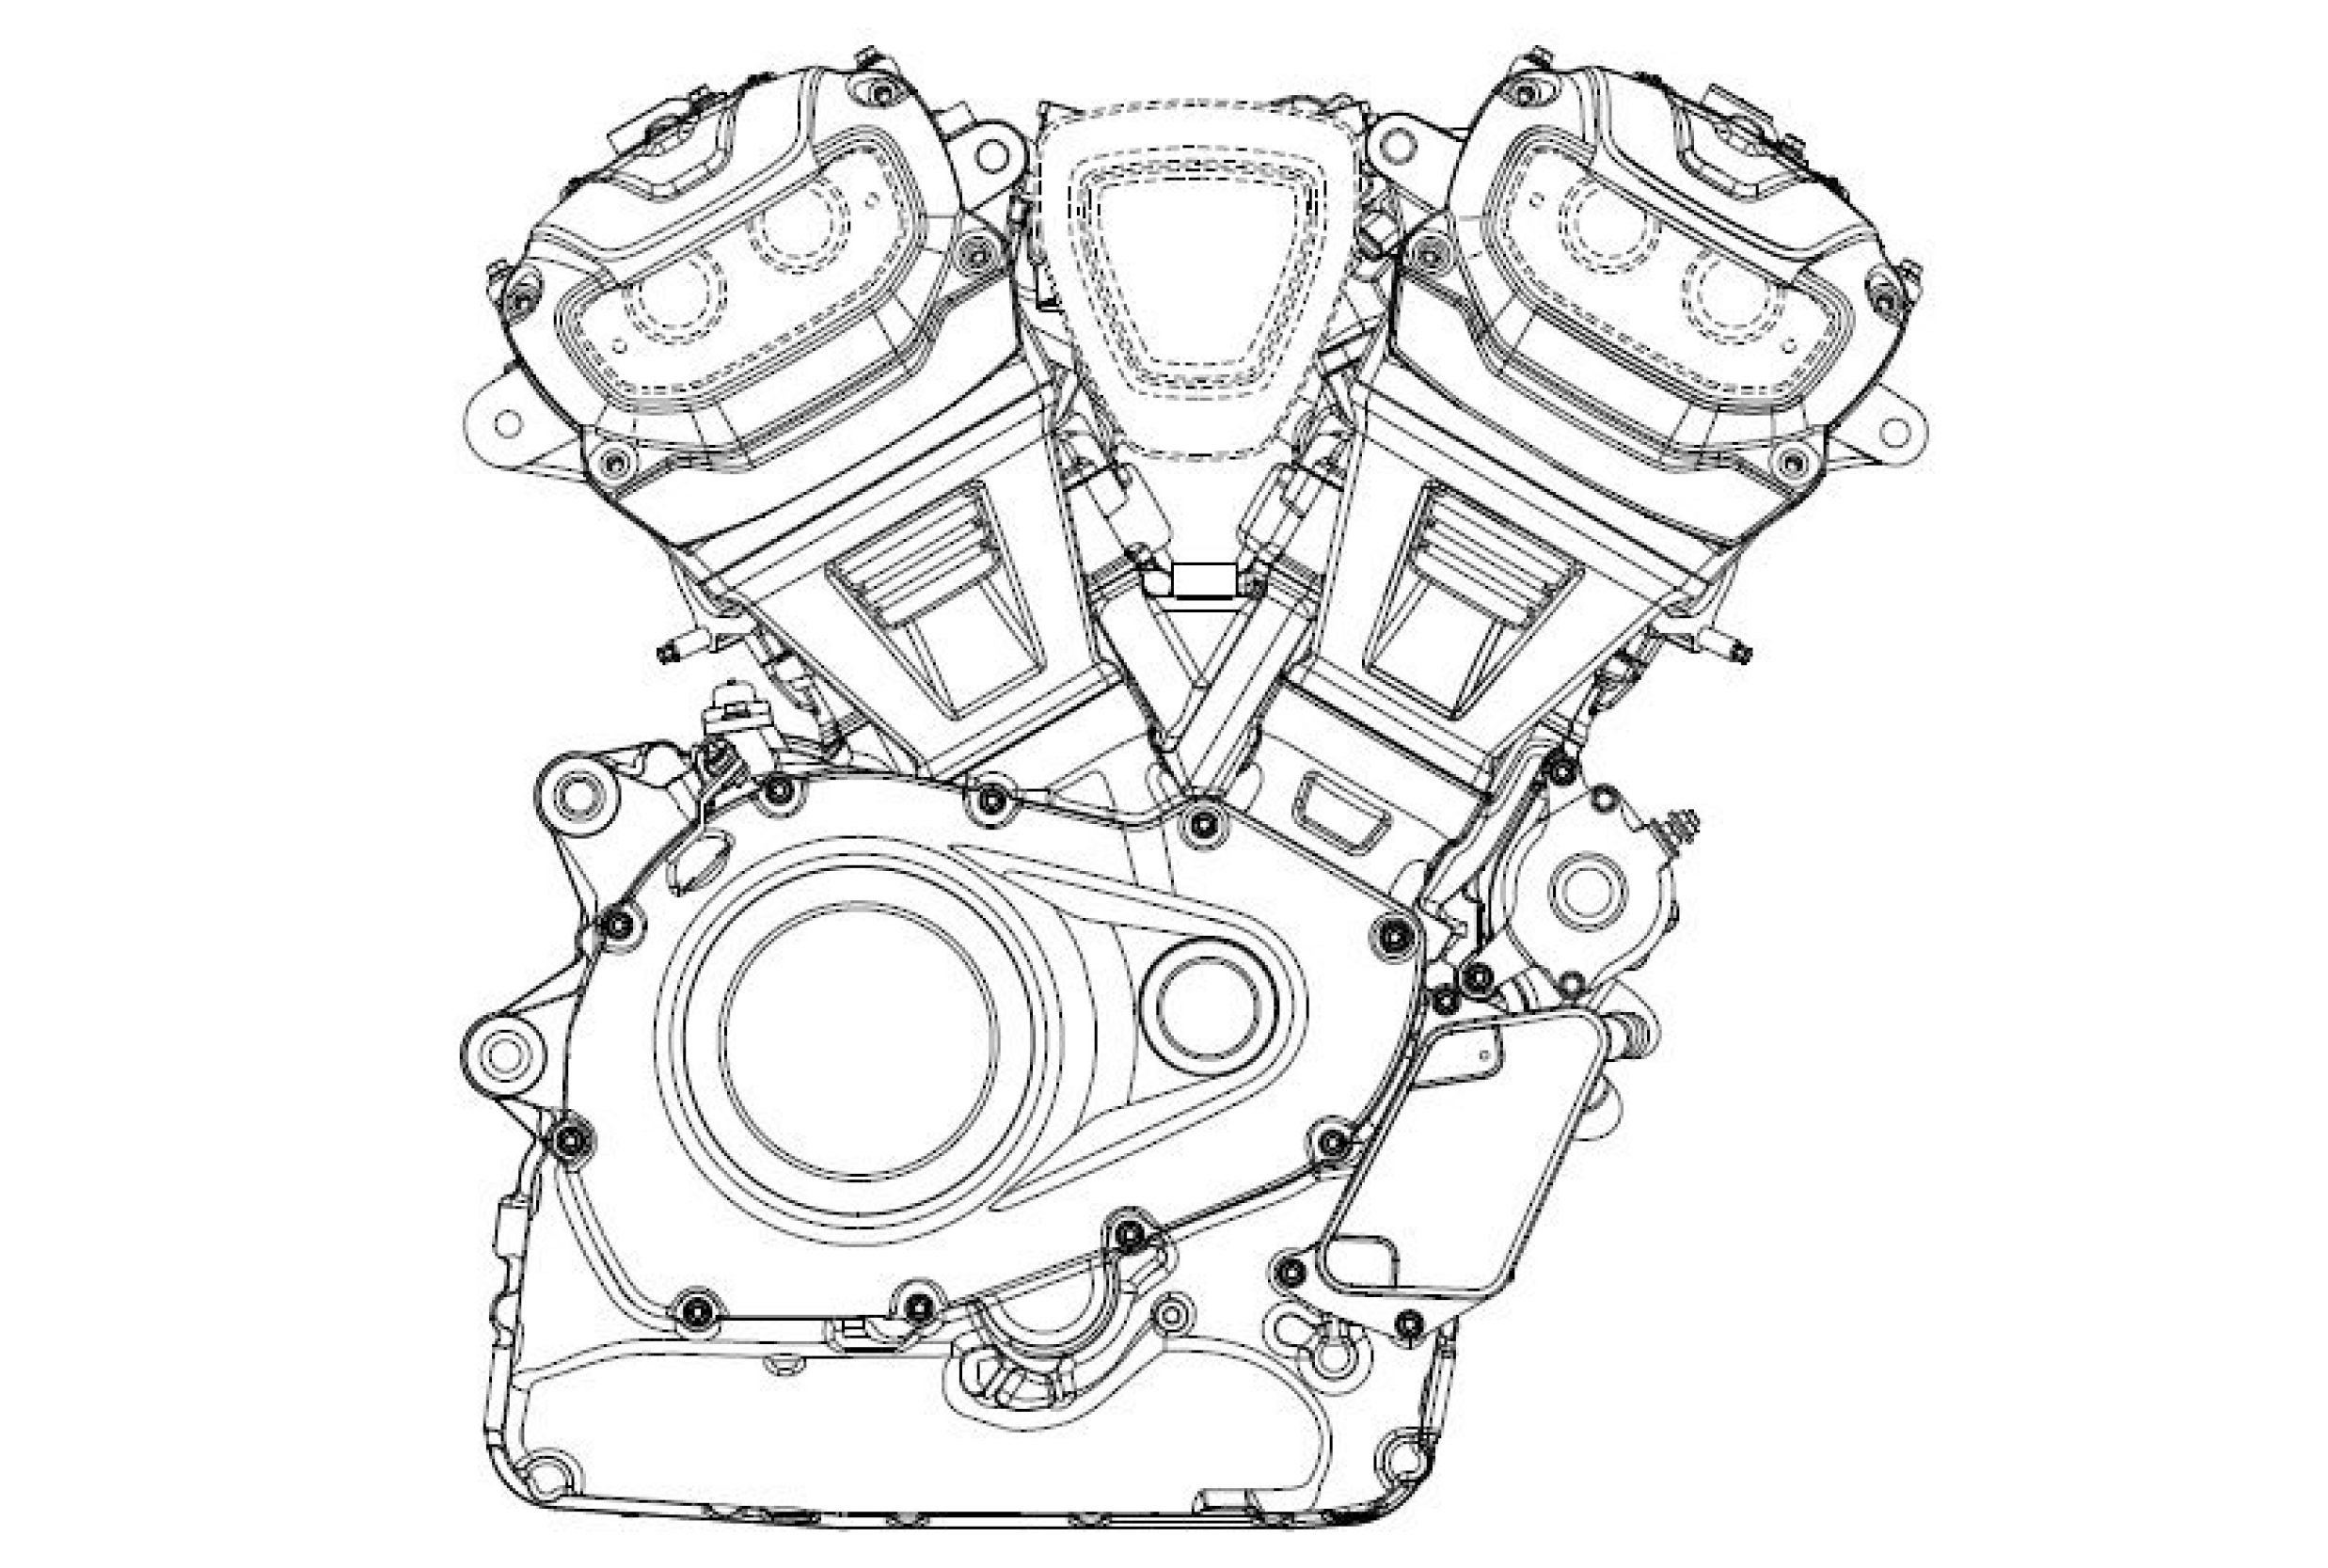 Harley engine filing